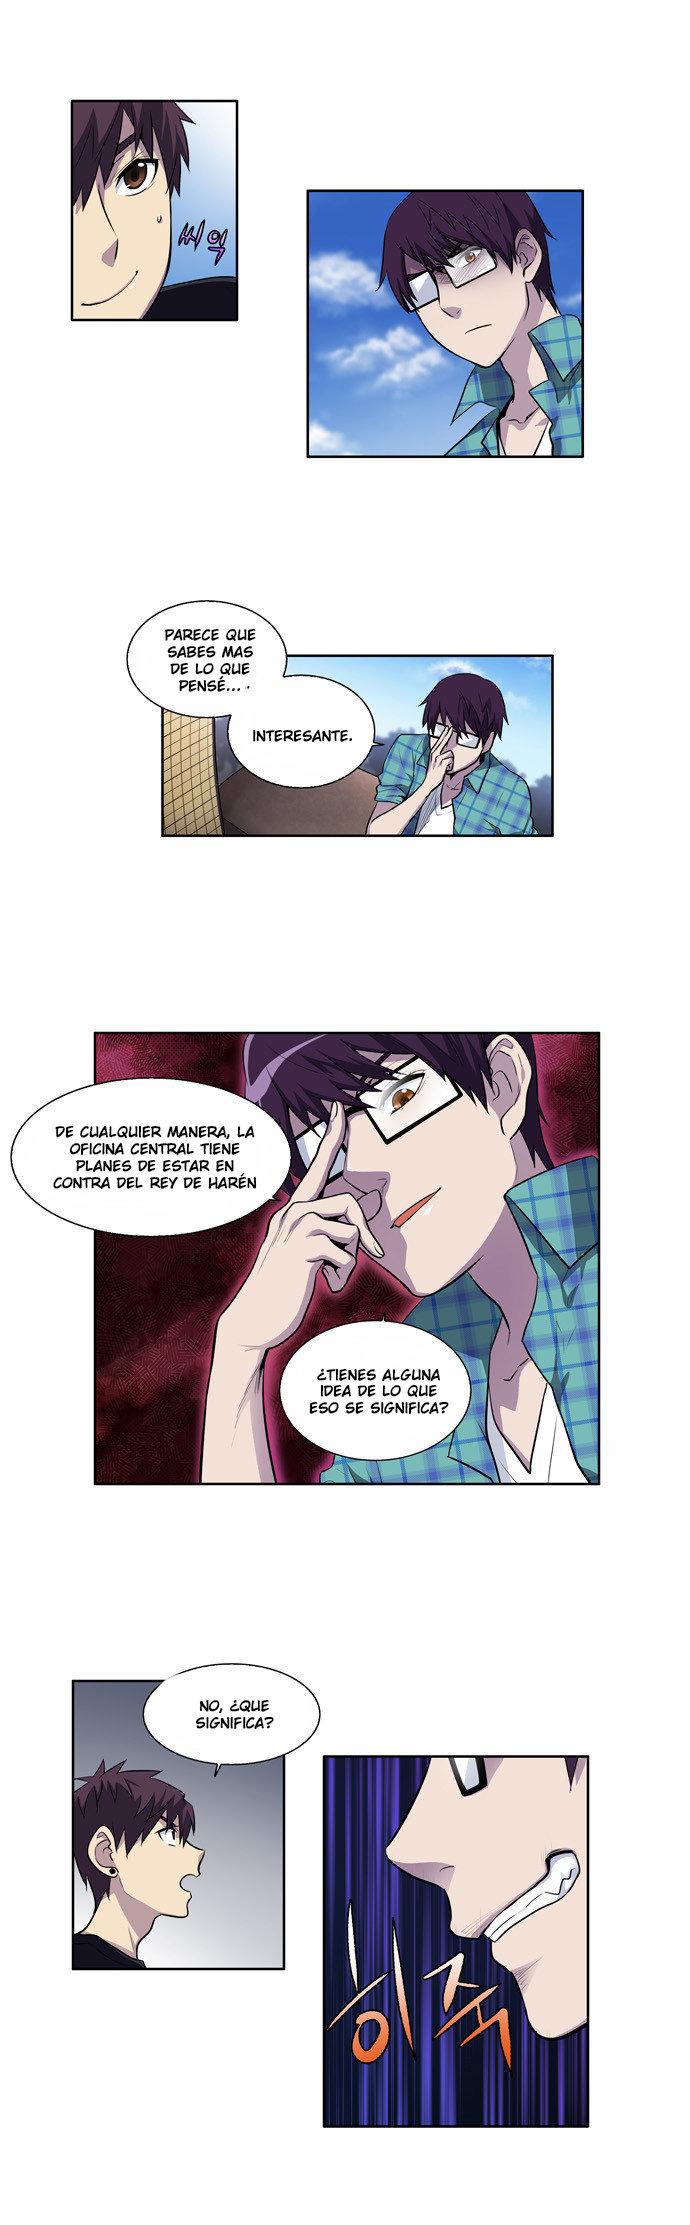 https://c5.ninemanga.com/es_manga/61/1725/439979/8471949afb27a55859ad36a5e8f389c5.jpg Page 4